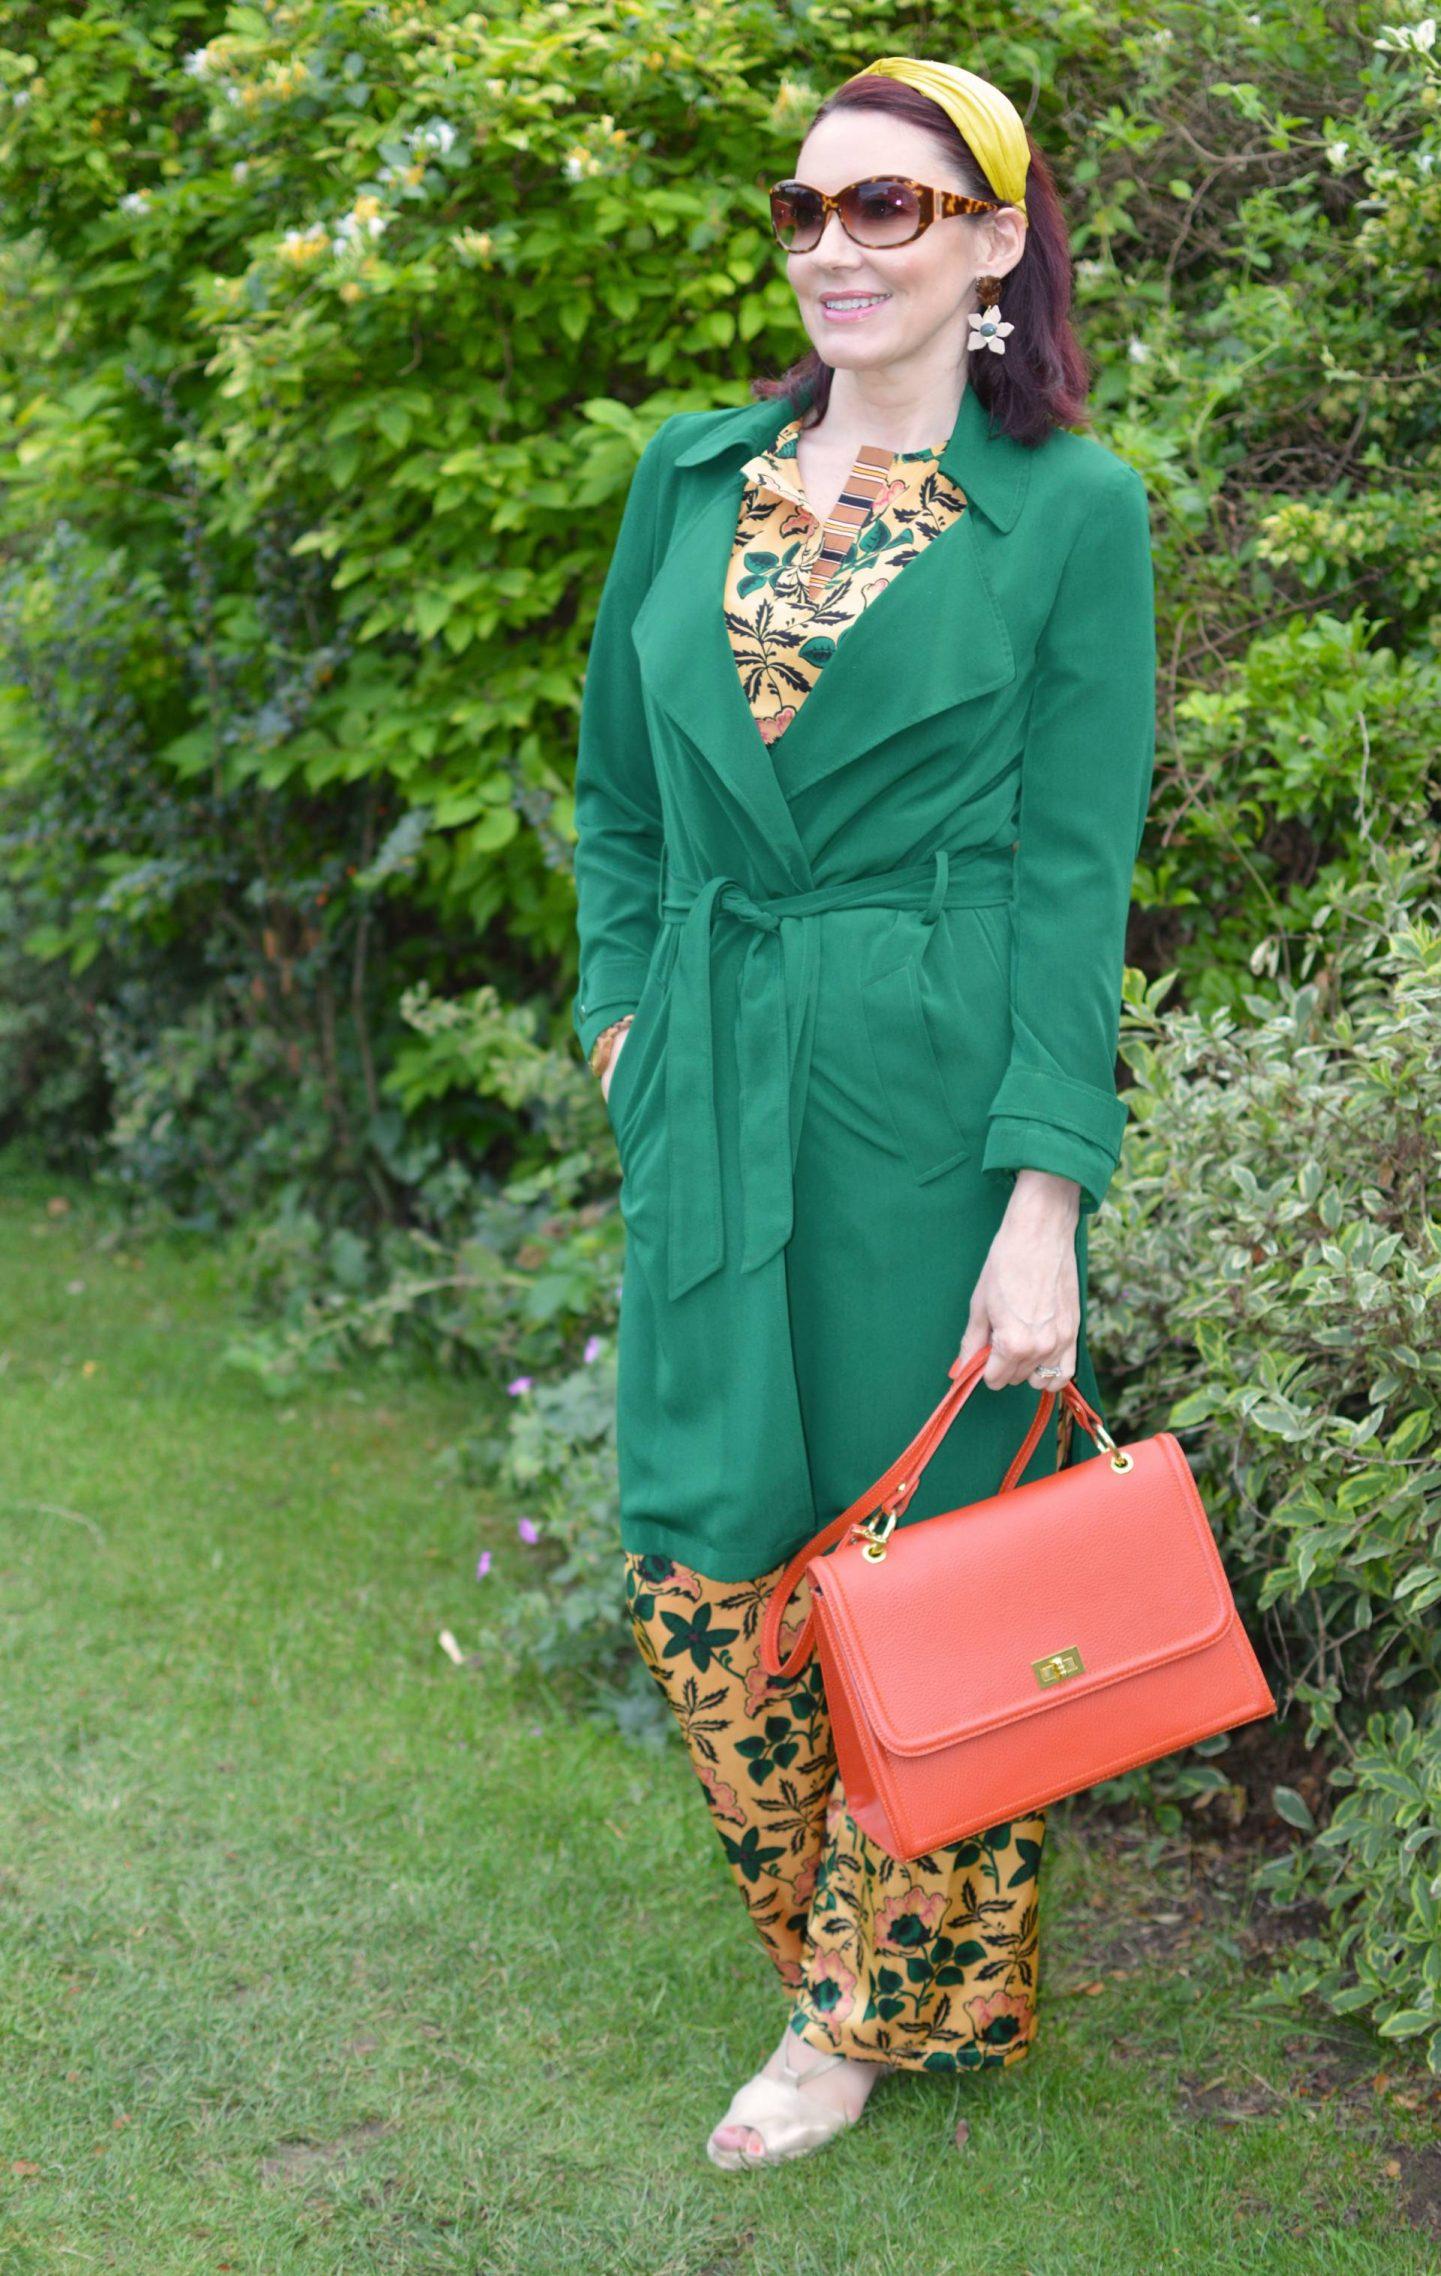 Scotch & Soda Floral Print Co-ord, green Papaya trench coat